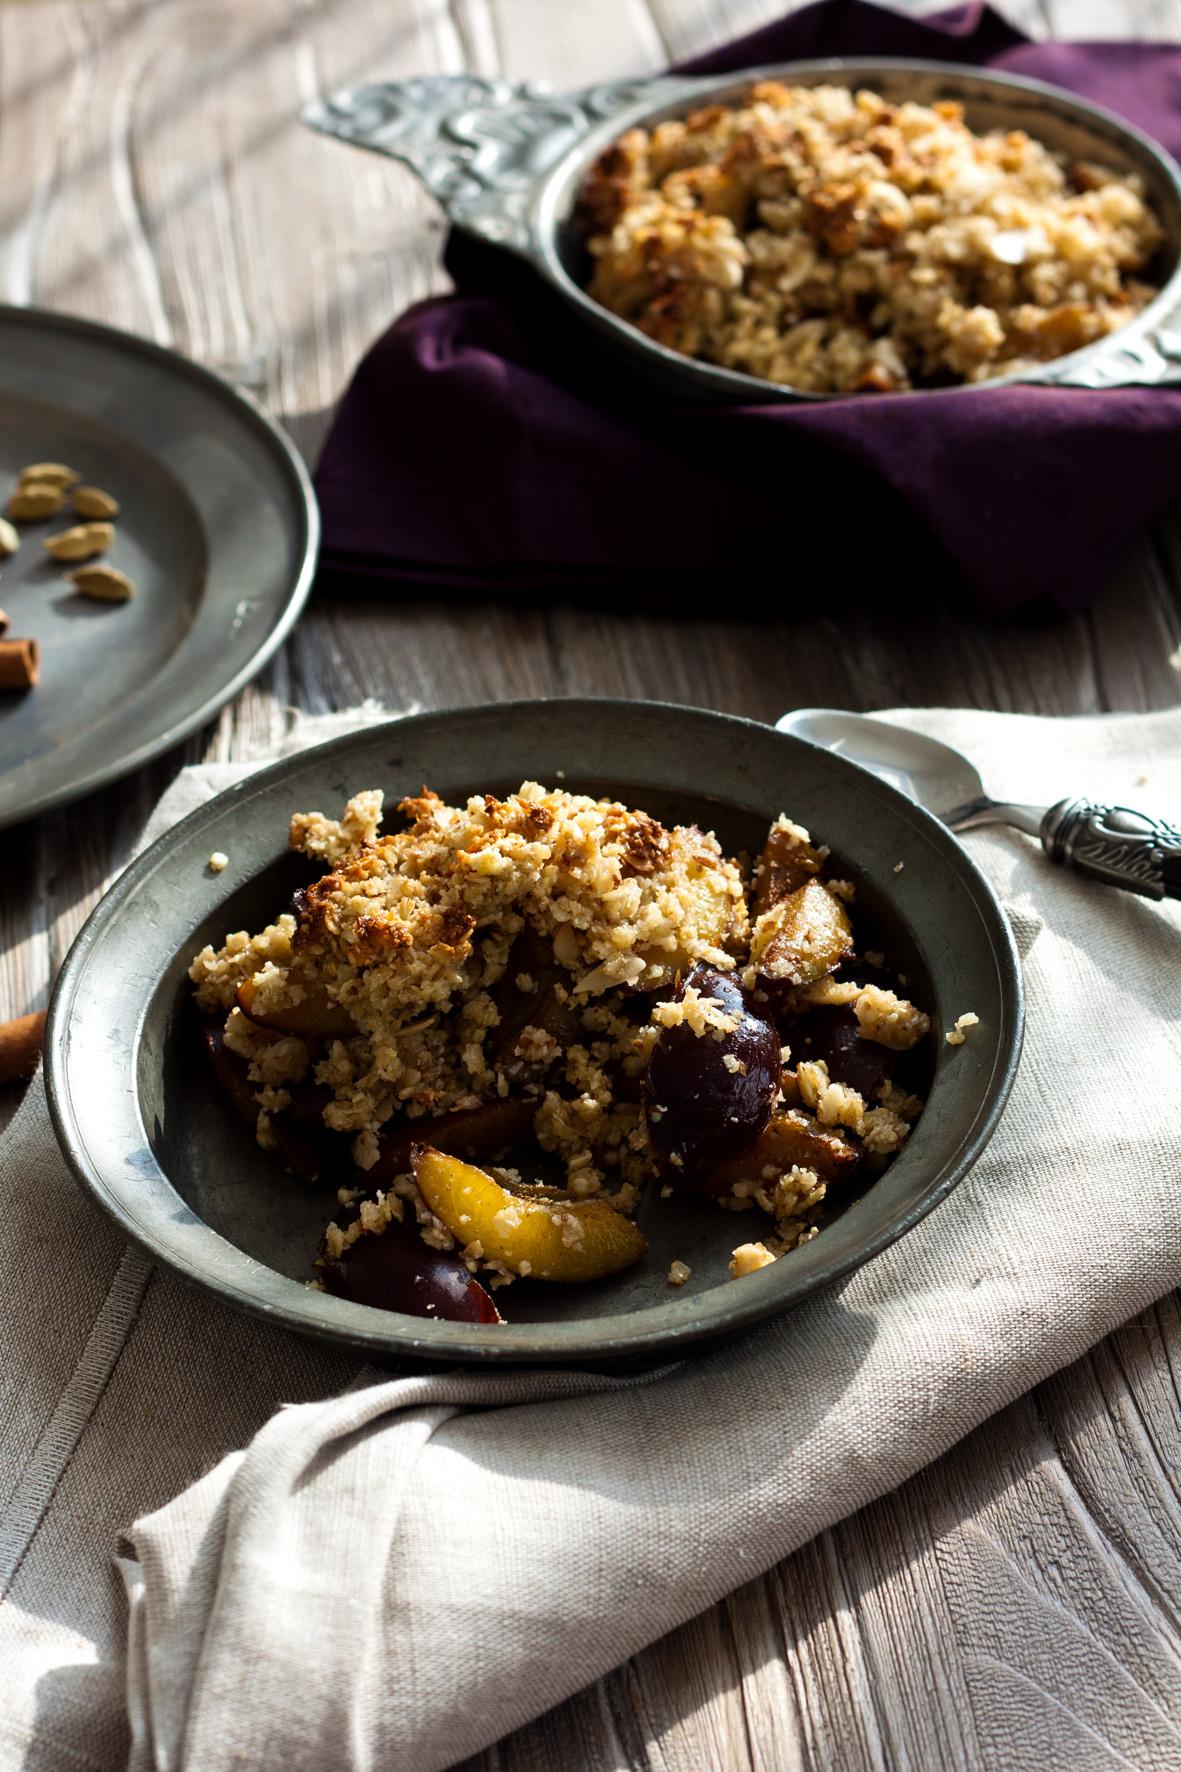 Pflaumen-Crumble-Quinoa-Buchweizen-2